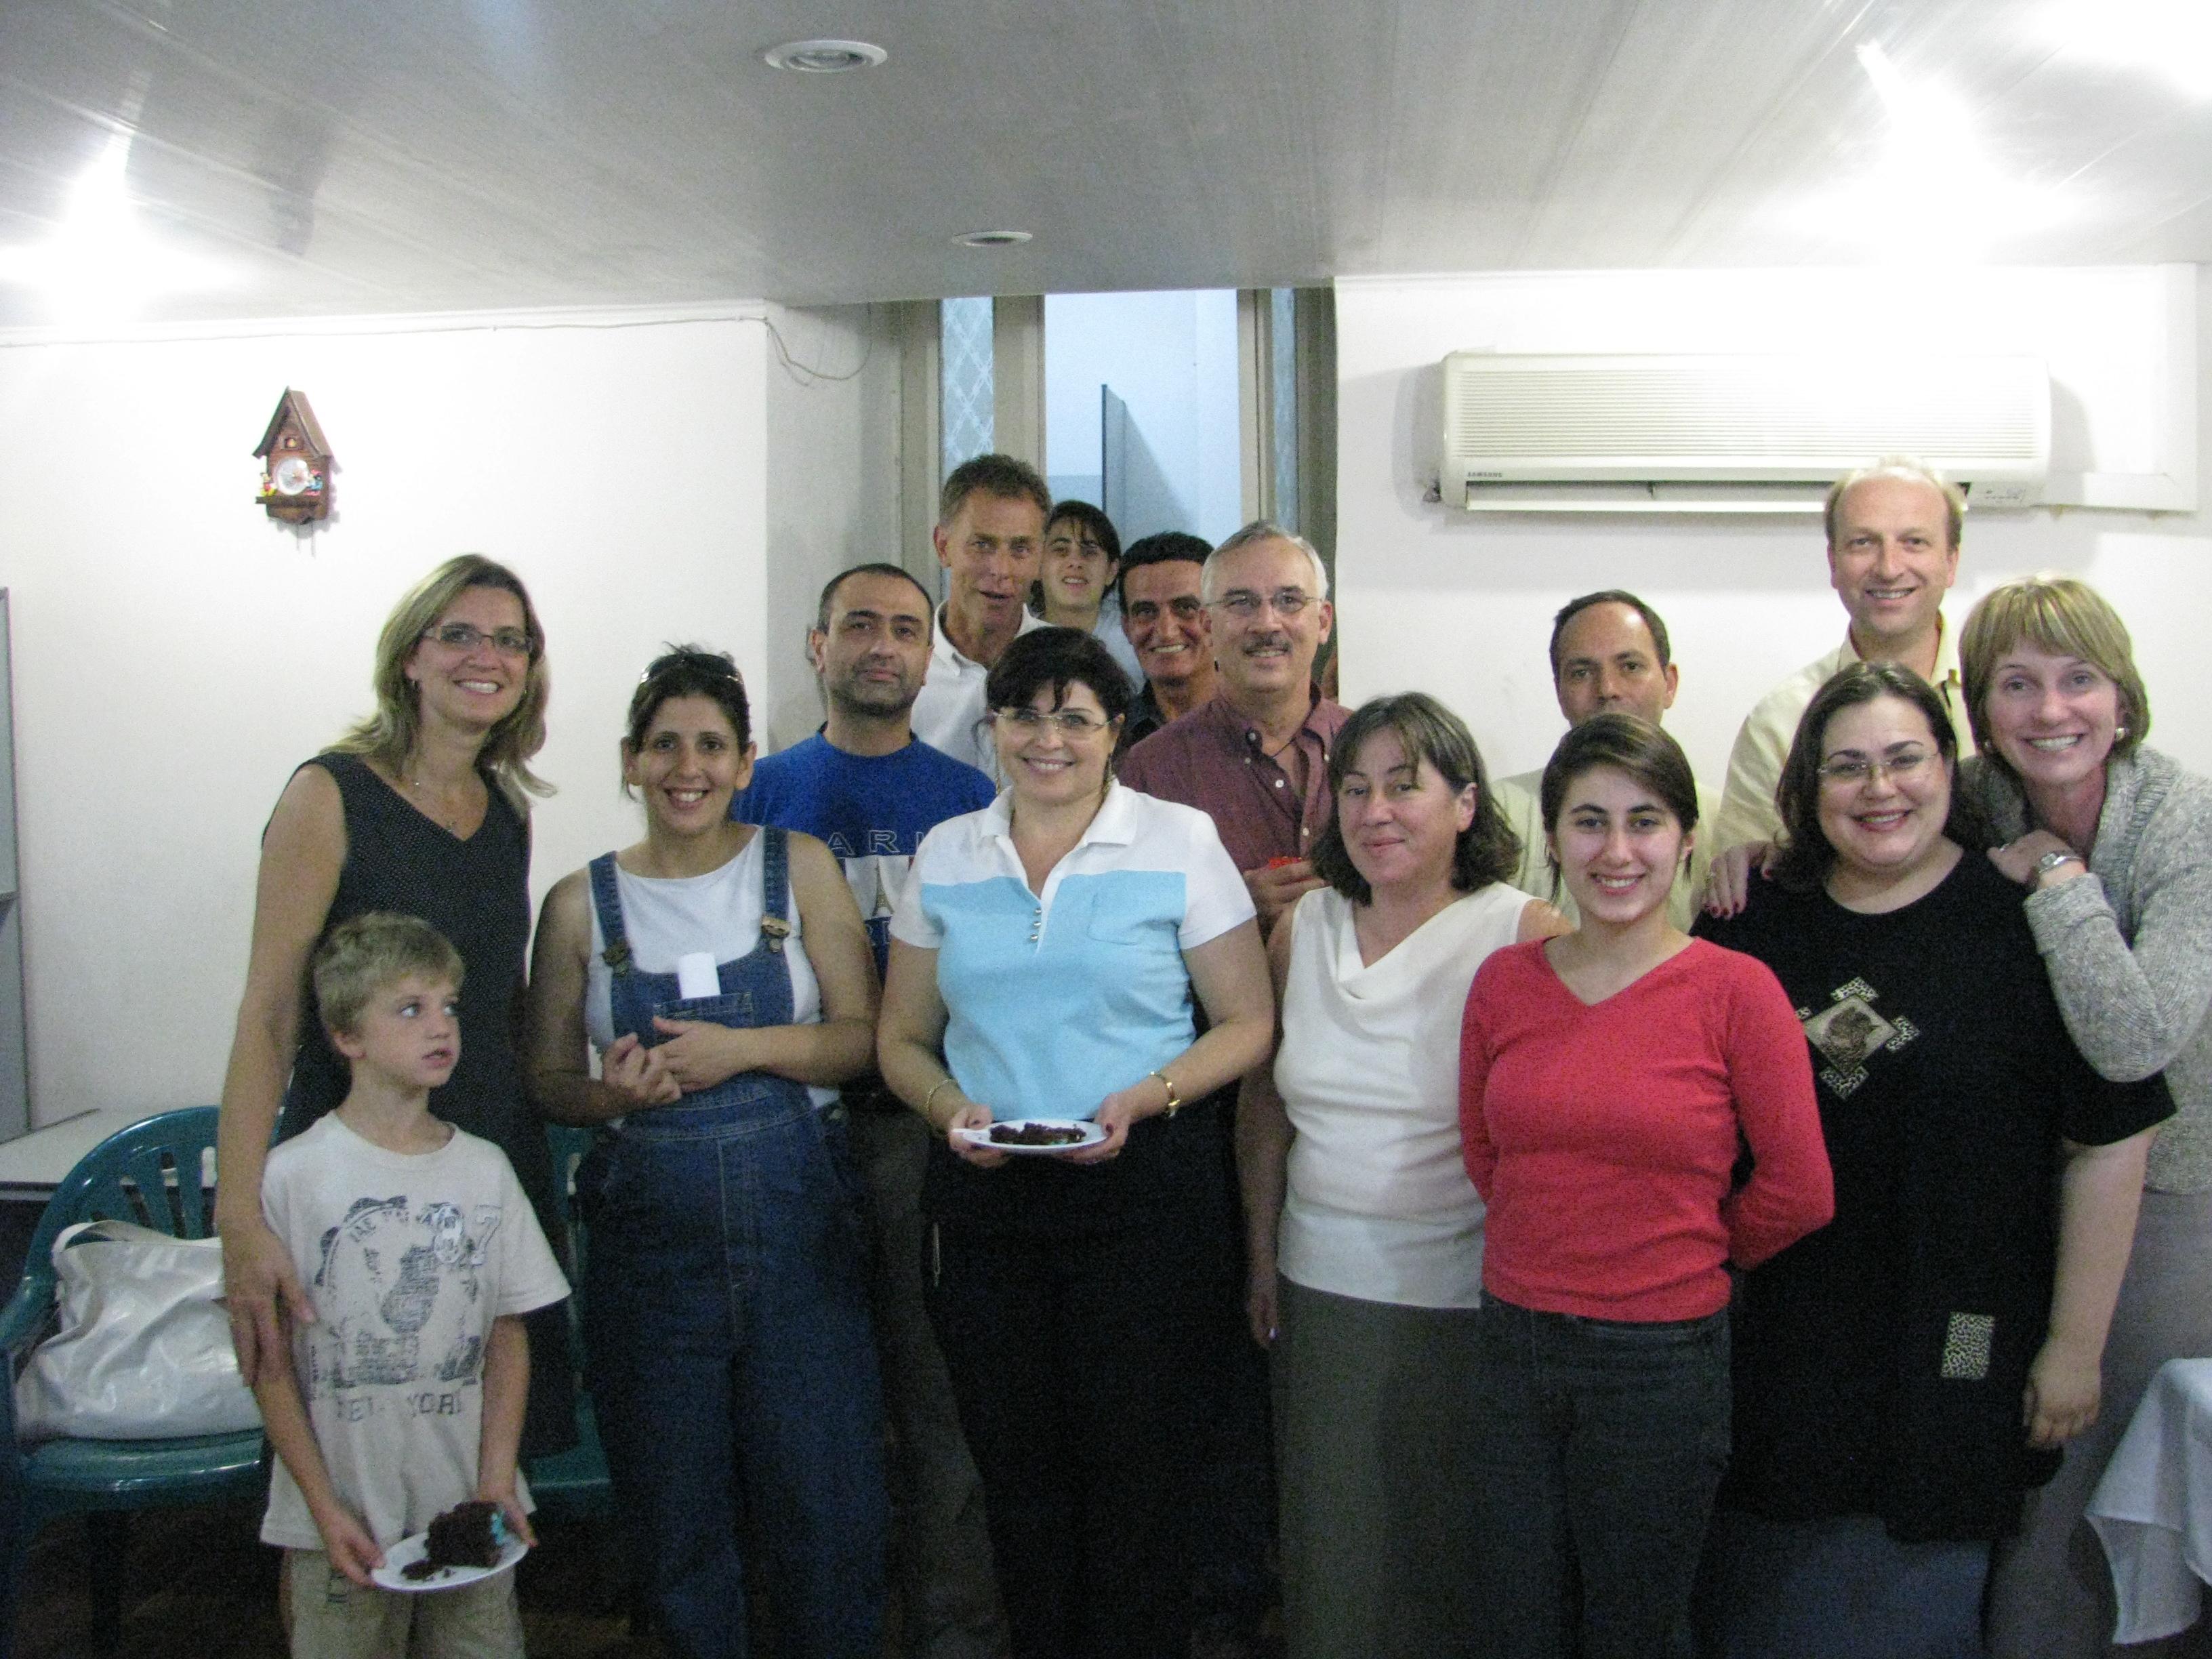 bif-ministry-center-023.jpg